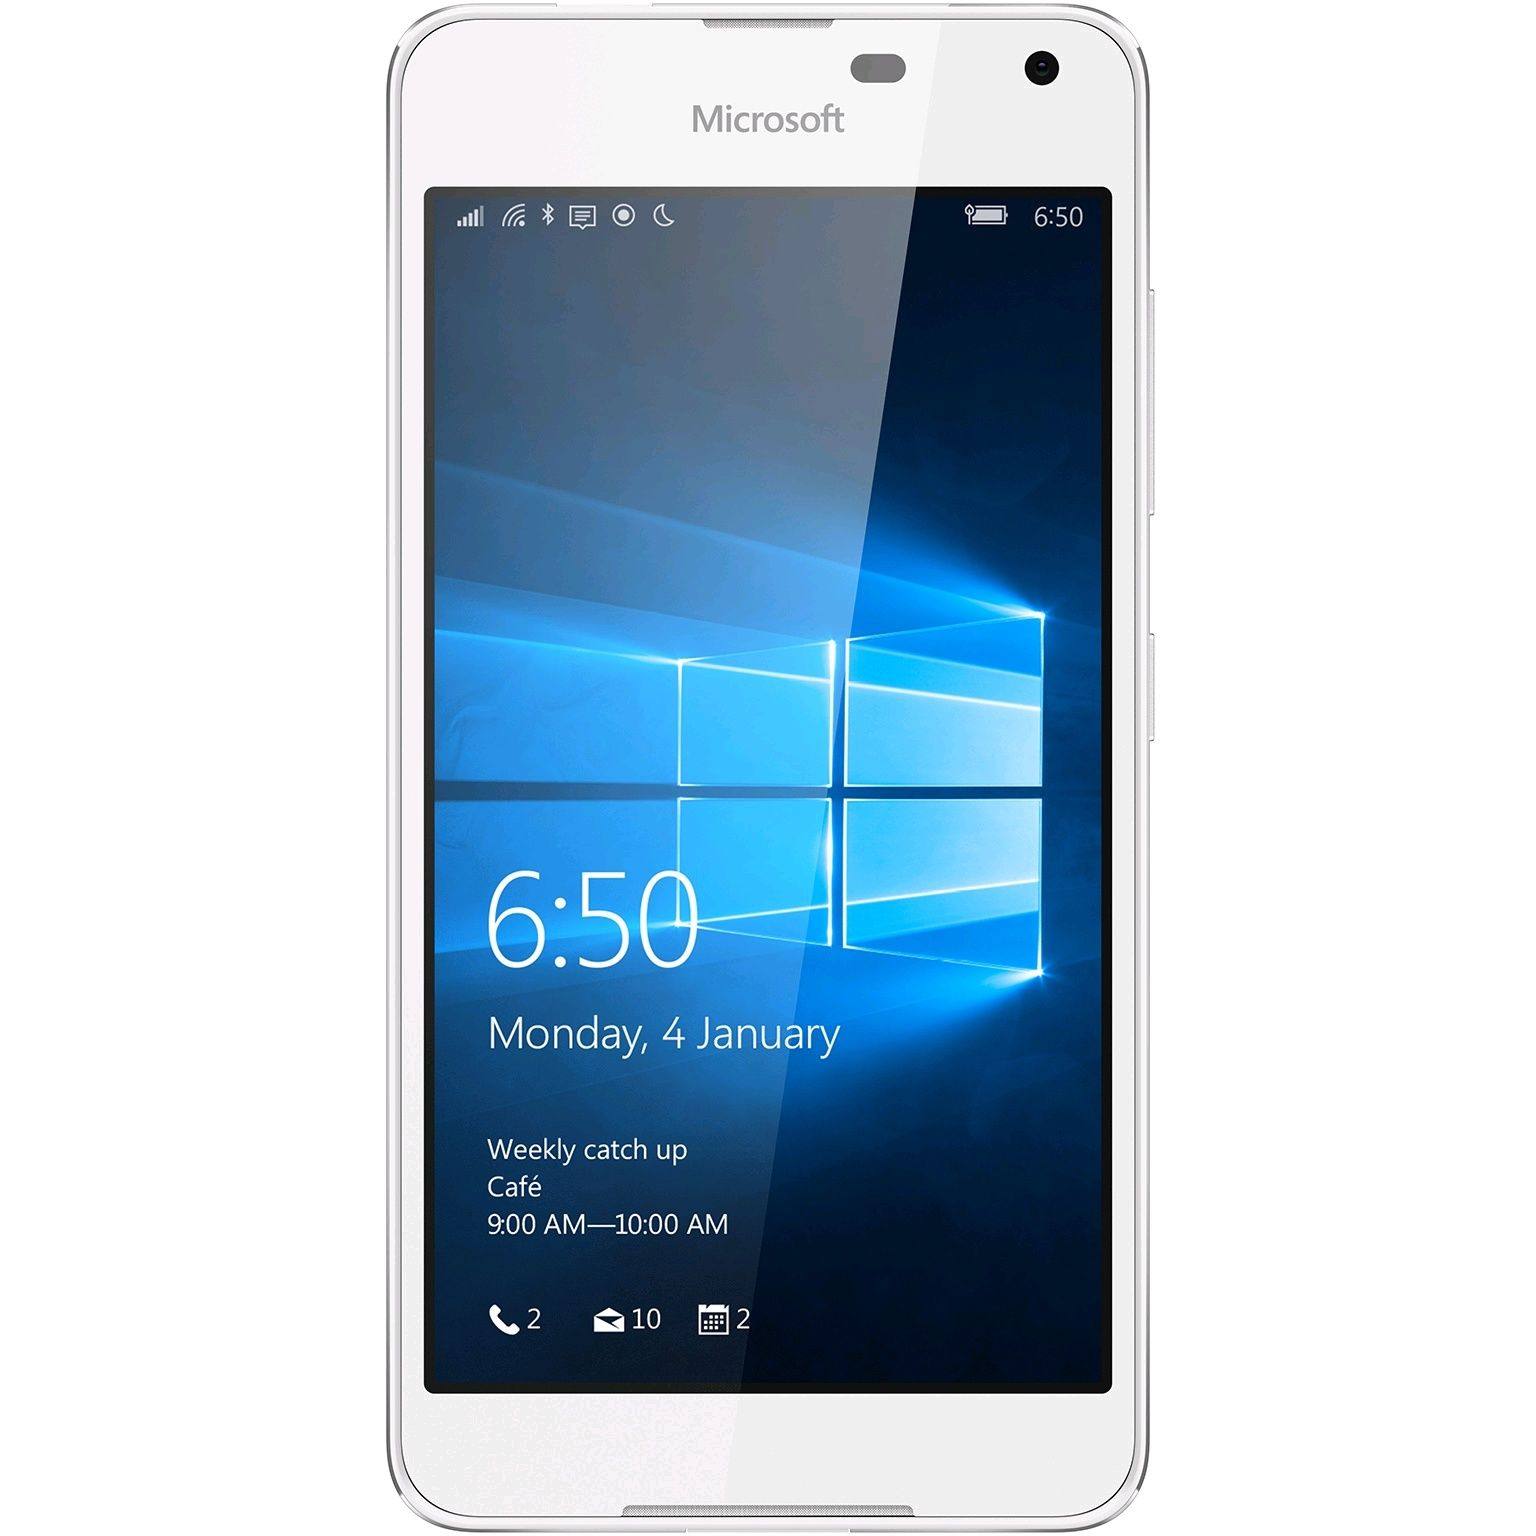 Nokia Microsoft Lumia 650 RM-1152 16GB (Factory Unlocked) - Black/White USA